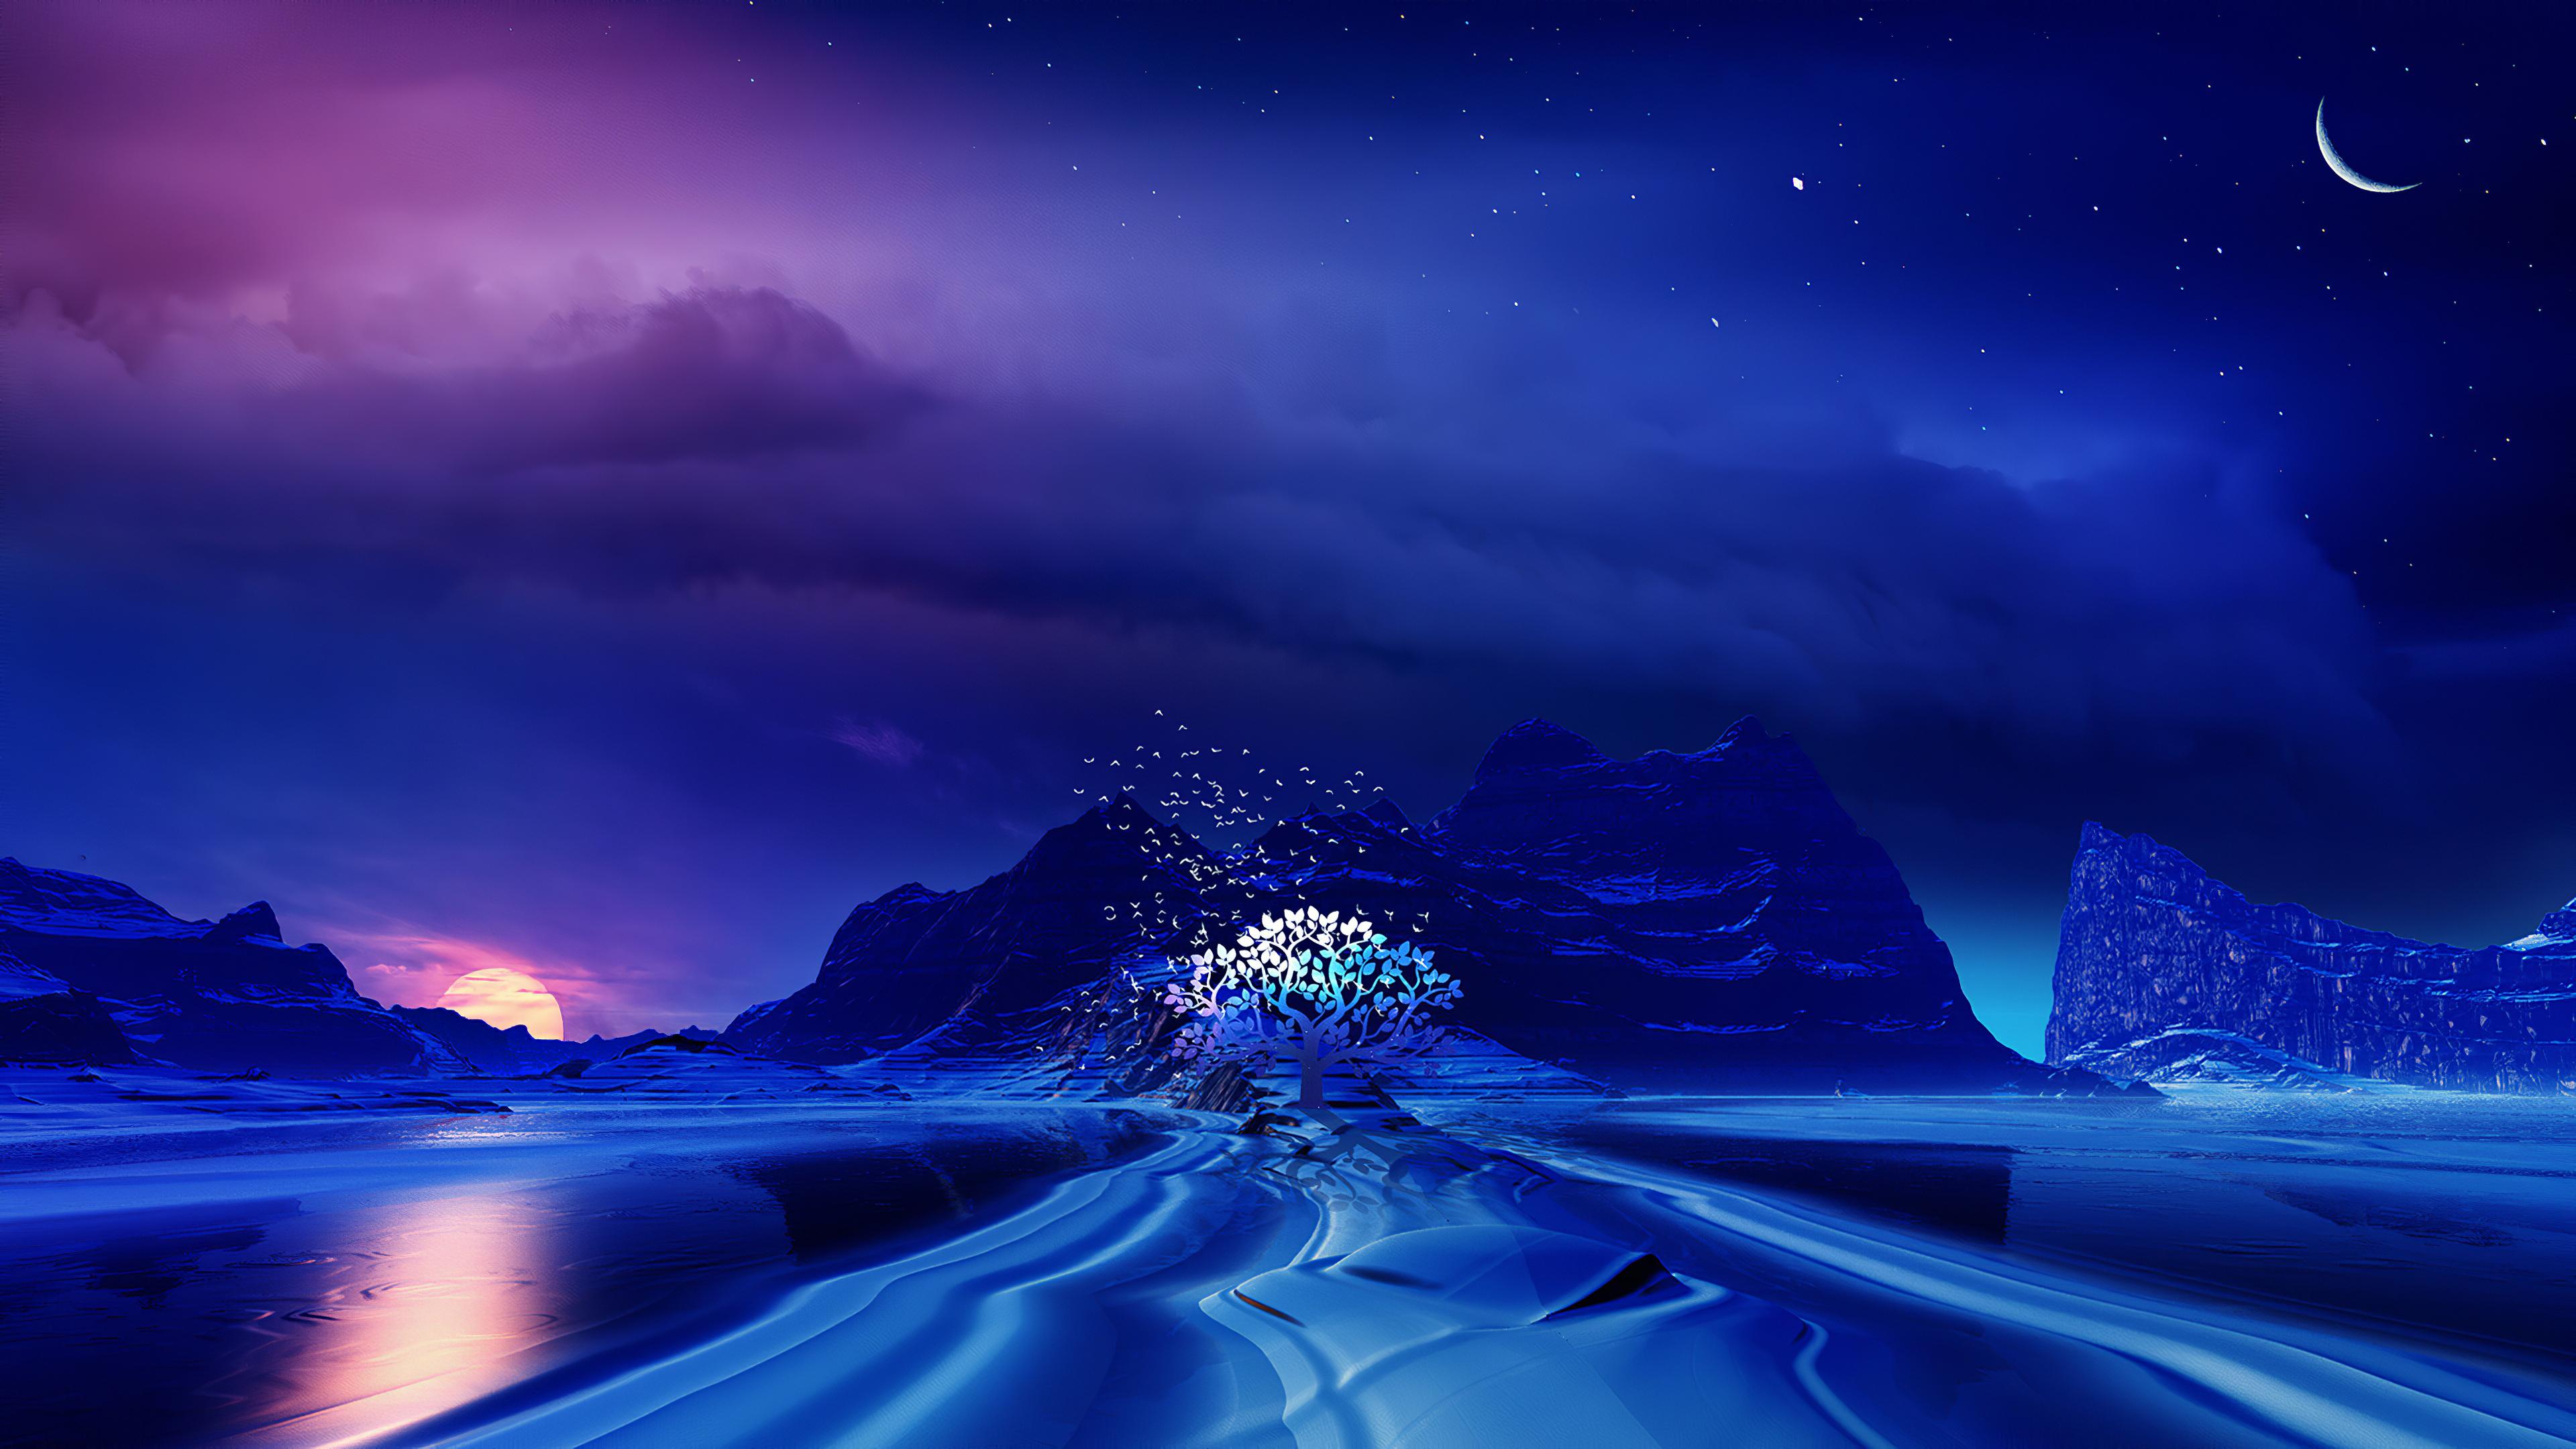 enchanting blues 1574940744 - Enchanting Blues -